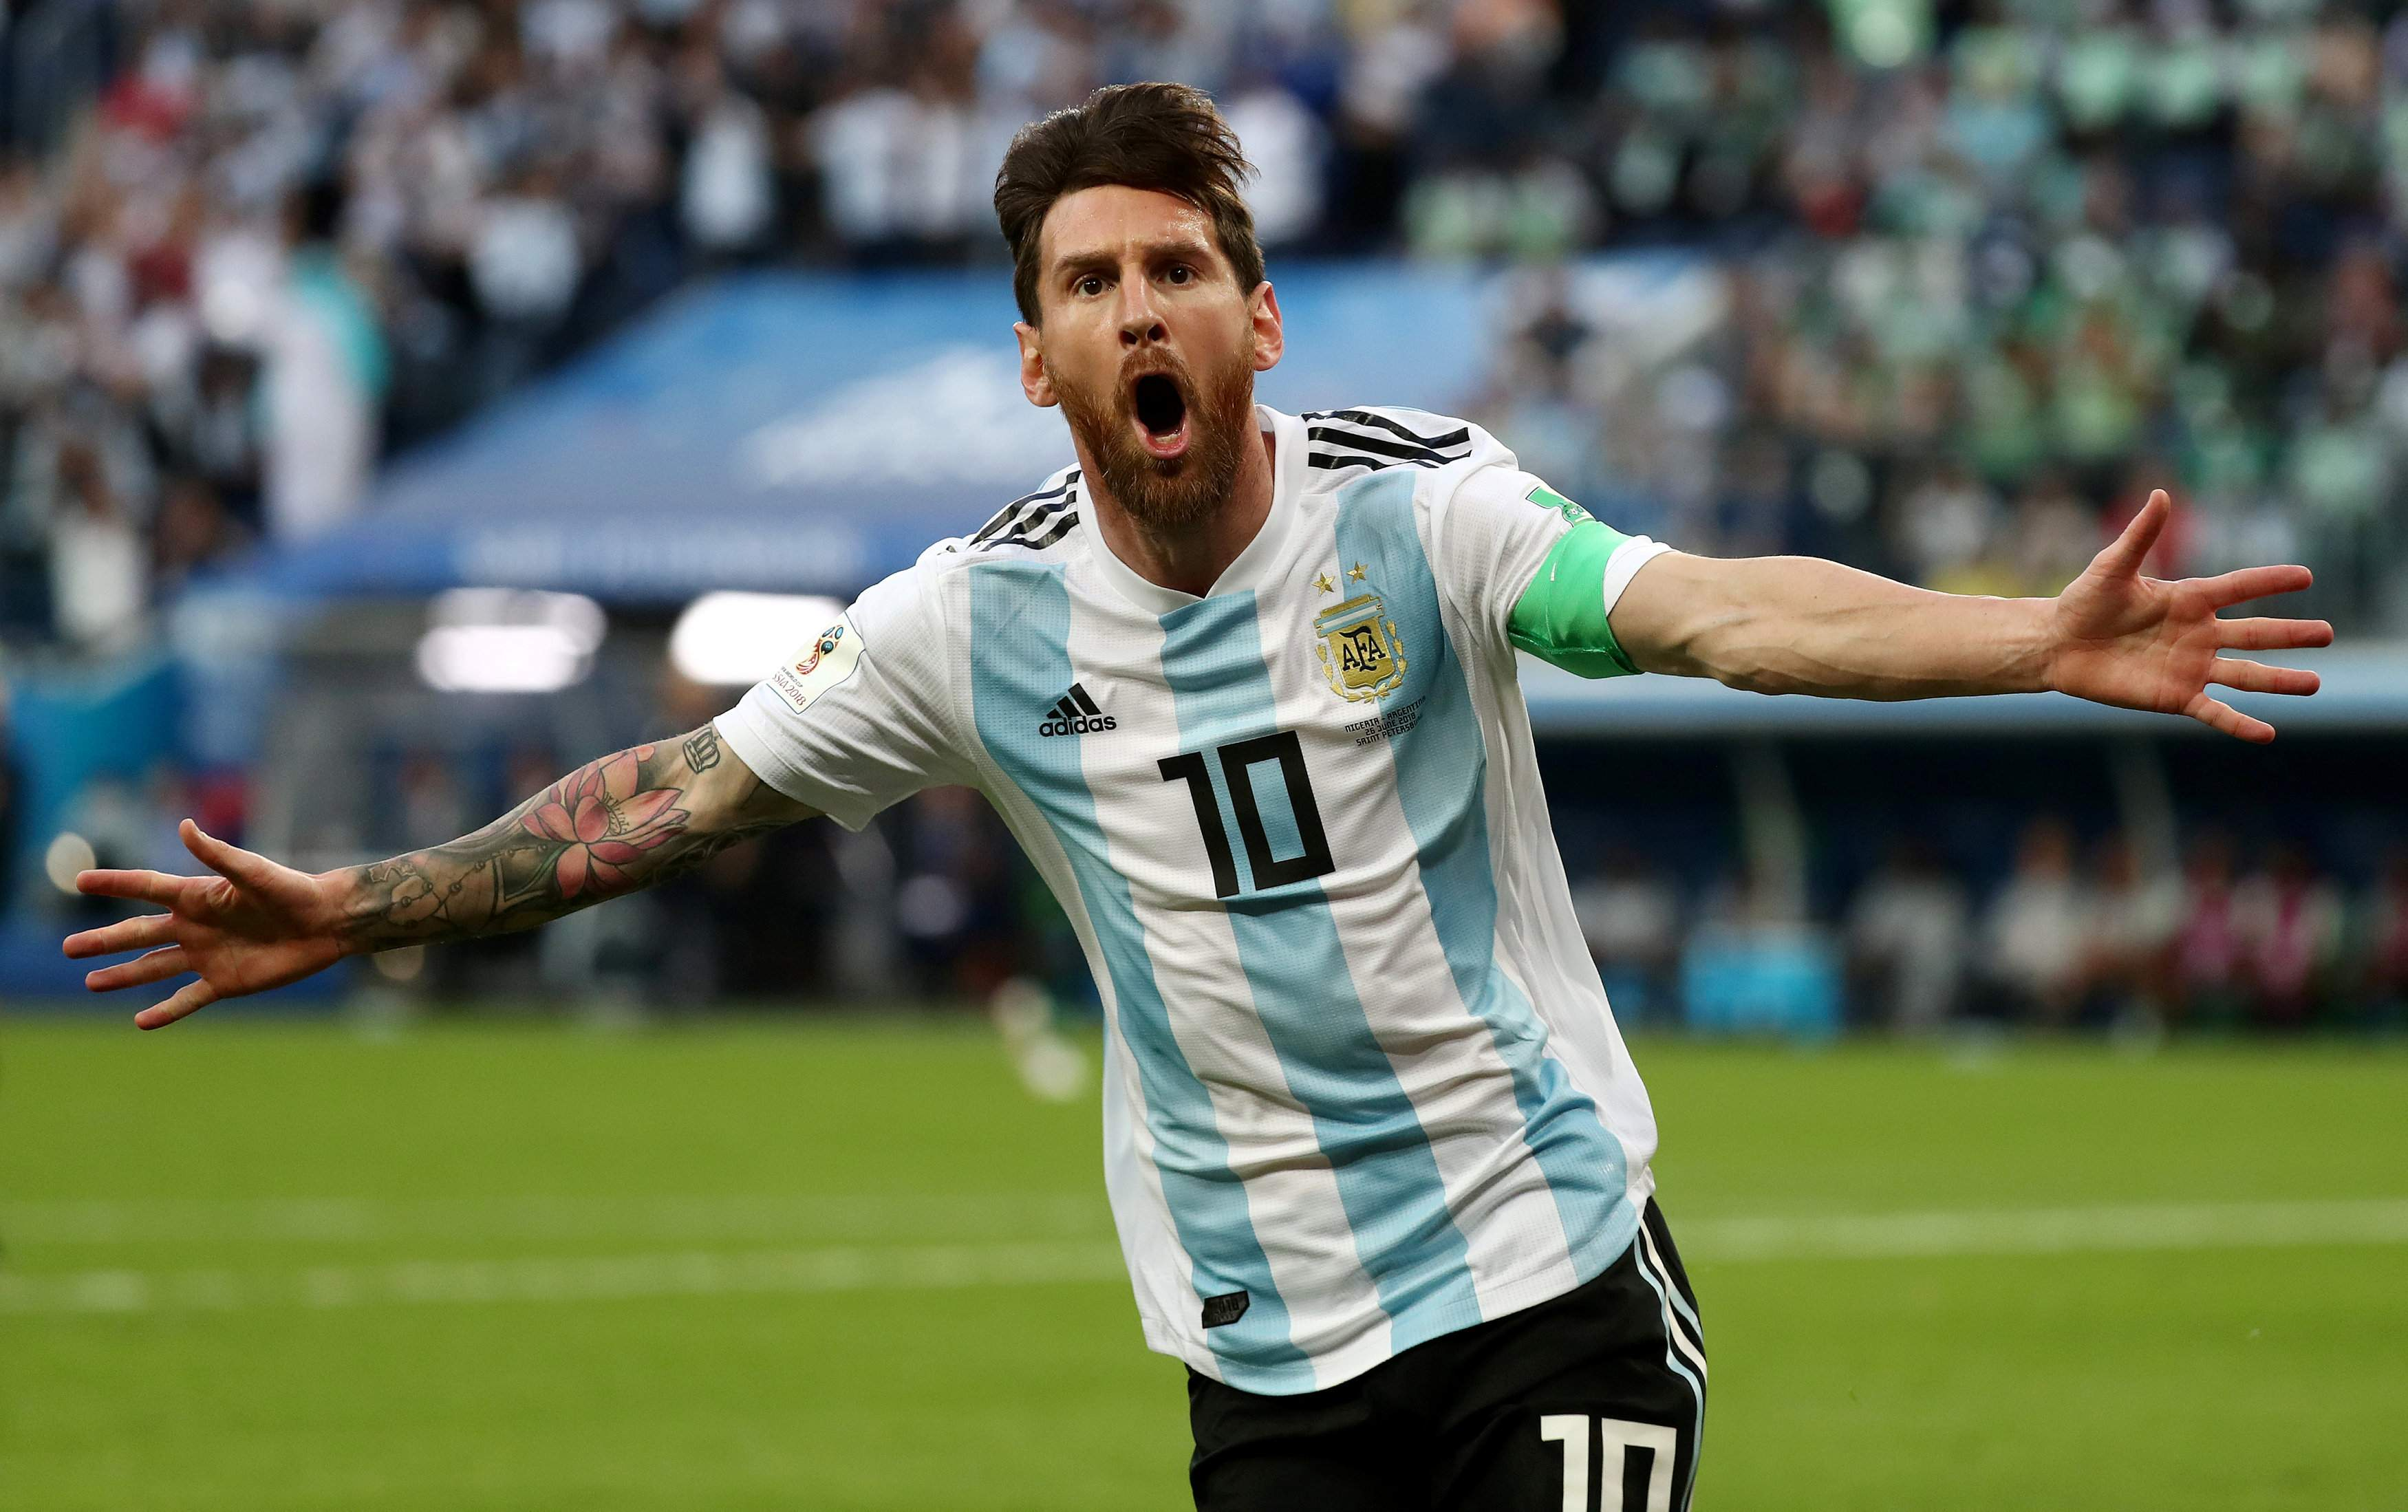 mundial-2018-messi-argentina-gol-reuters.jpg